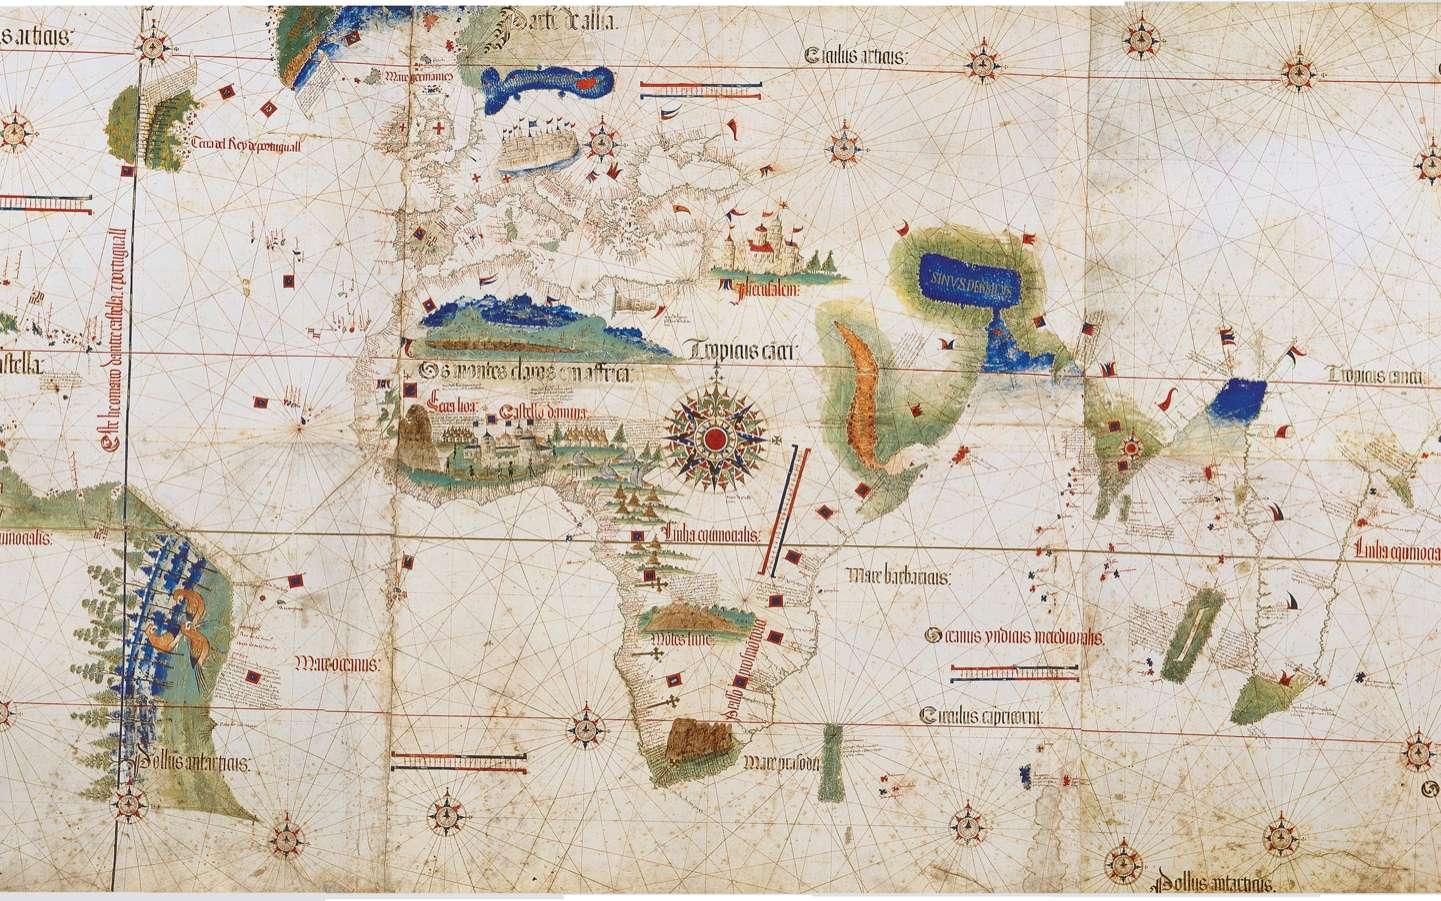 La carte du monde de Cantino, Biblioteca Estense, Modène, (Italie). © Wikimedia Commons, domaine public